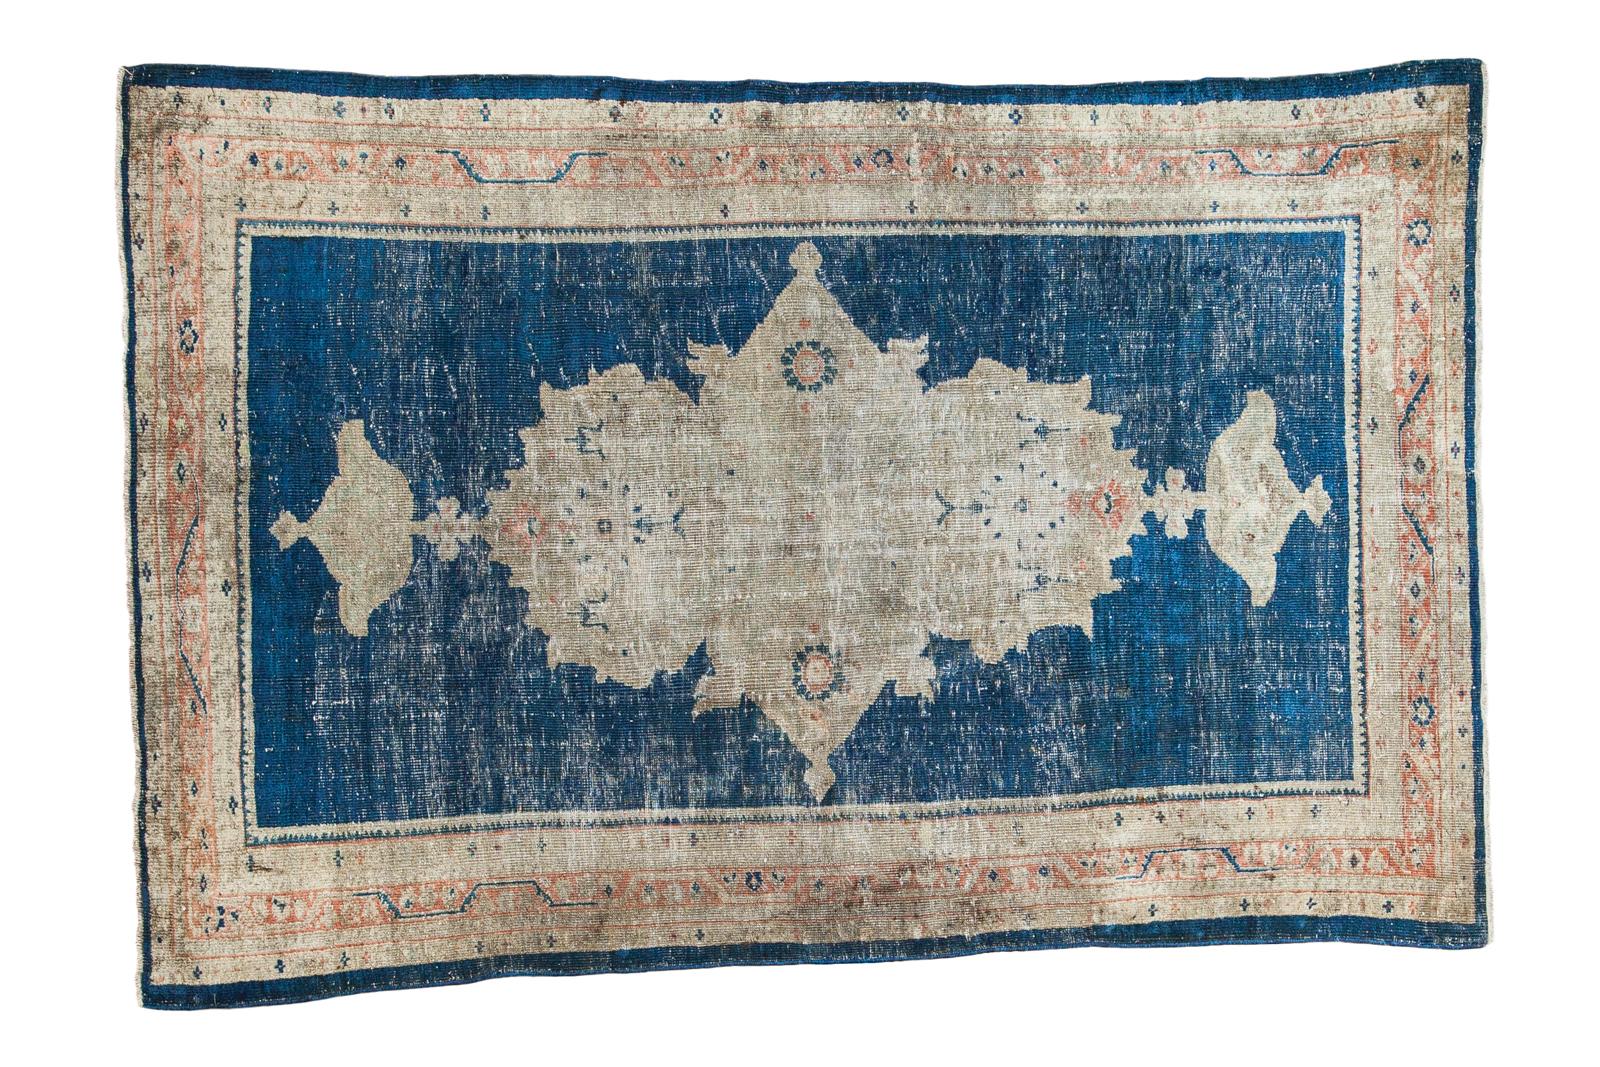 Antique Turkish Rug 1772  Westchester NY Rugs